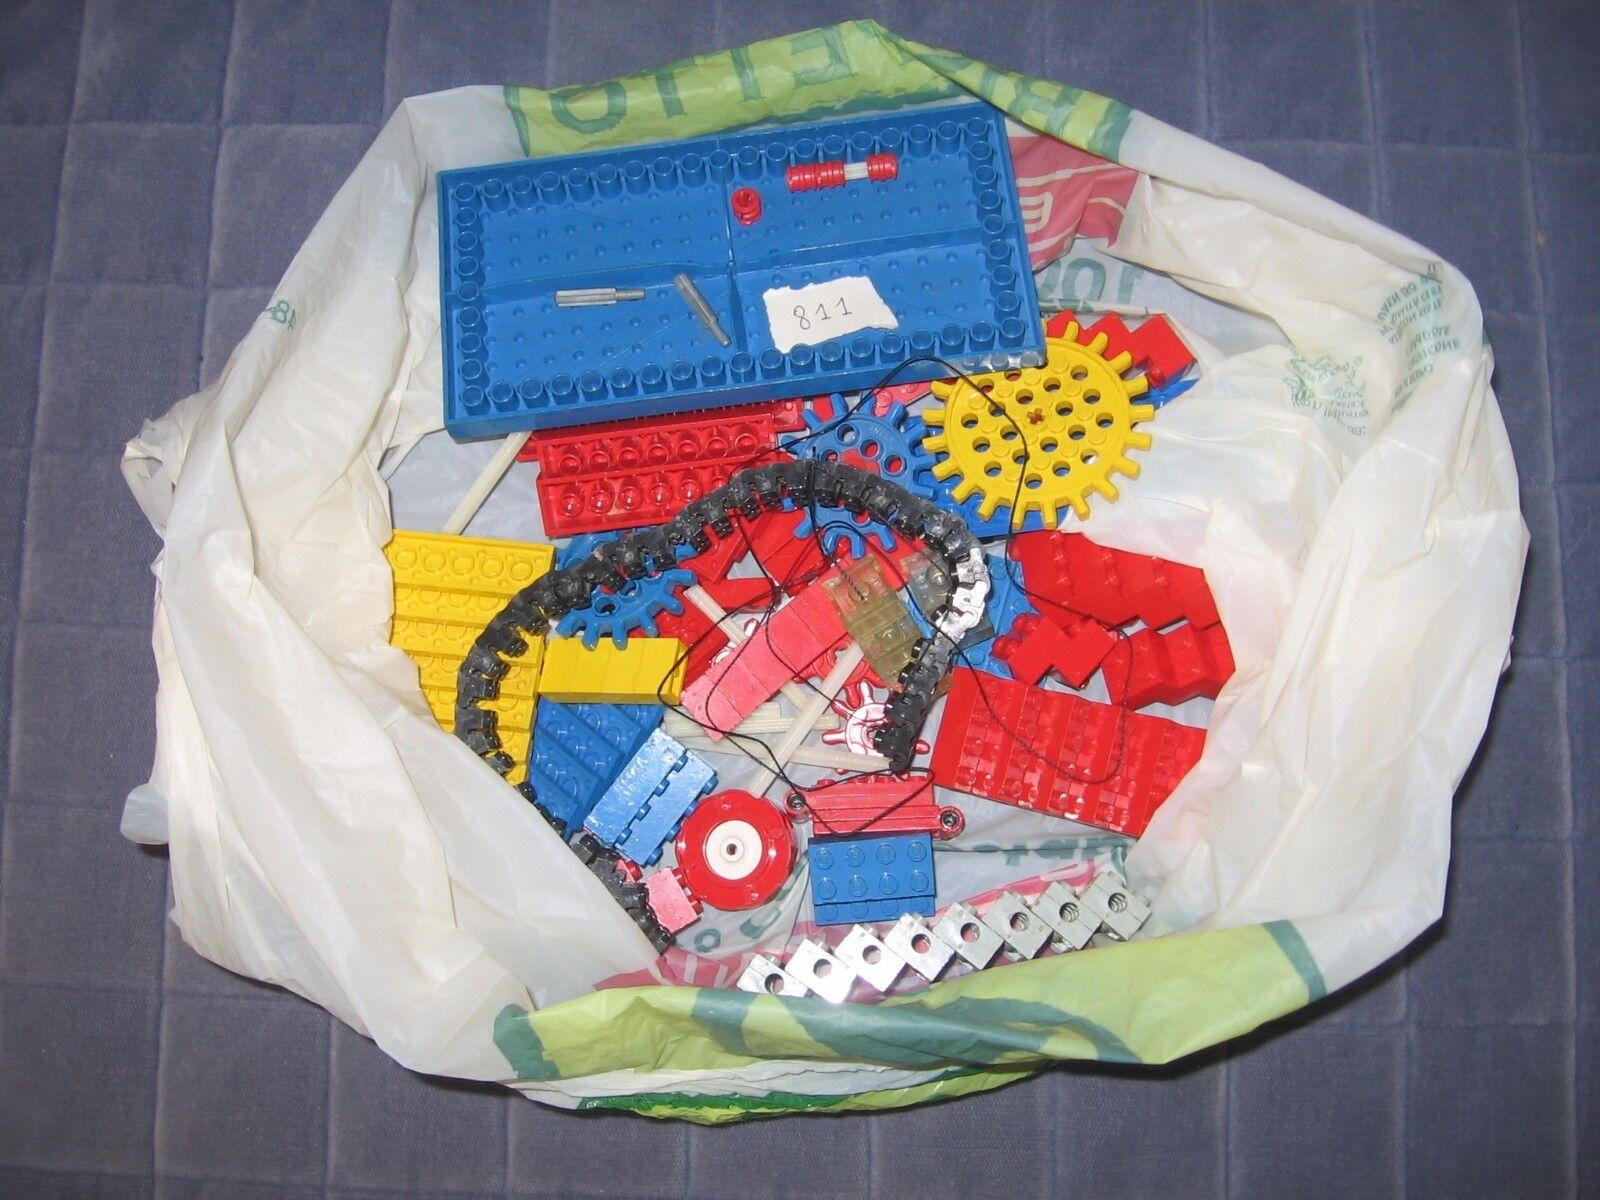 LEGO Scatola Universale 811 Gear Crane Set